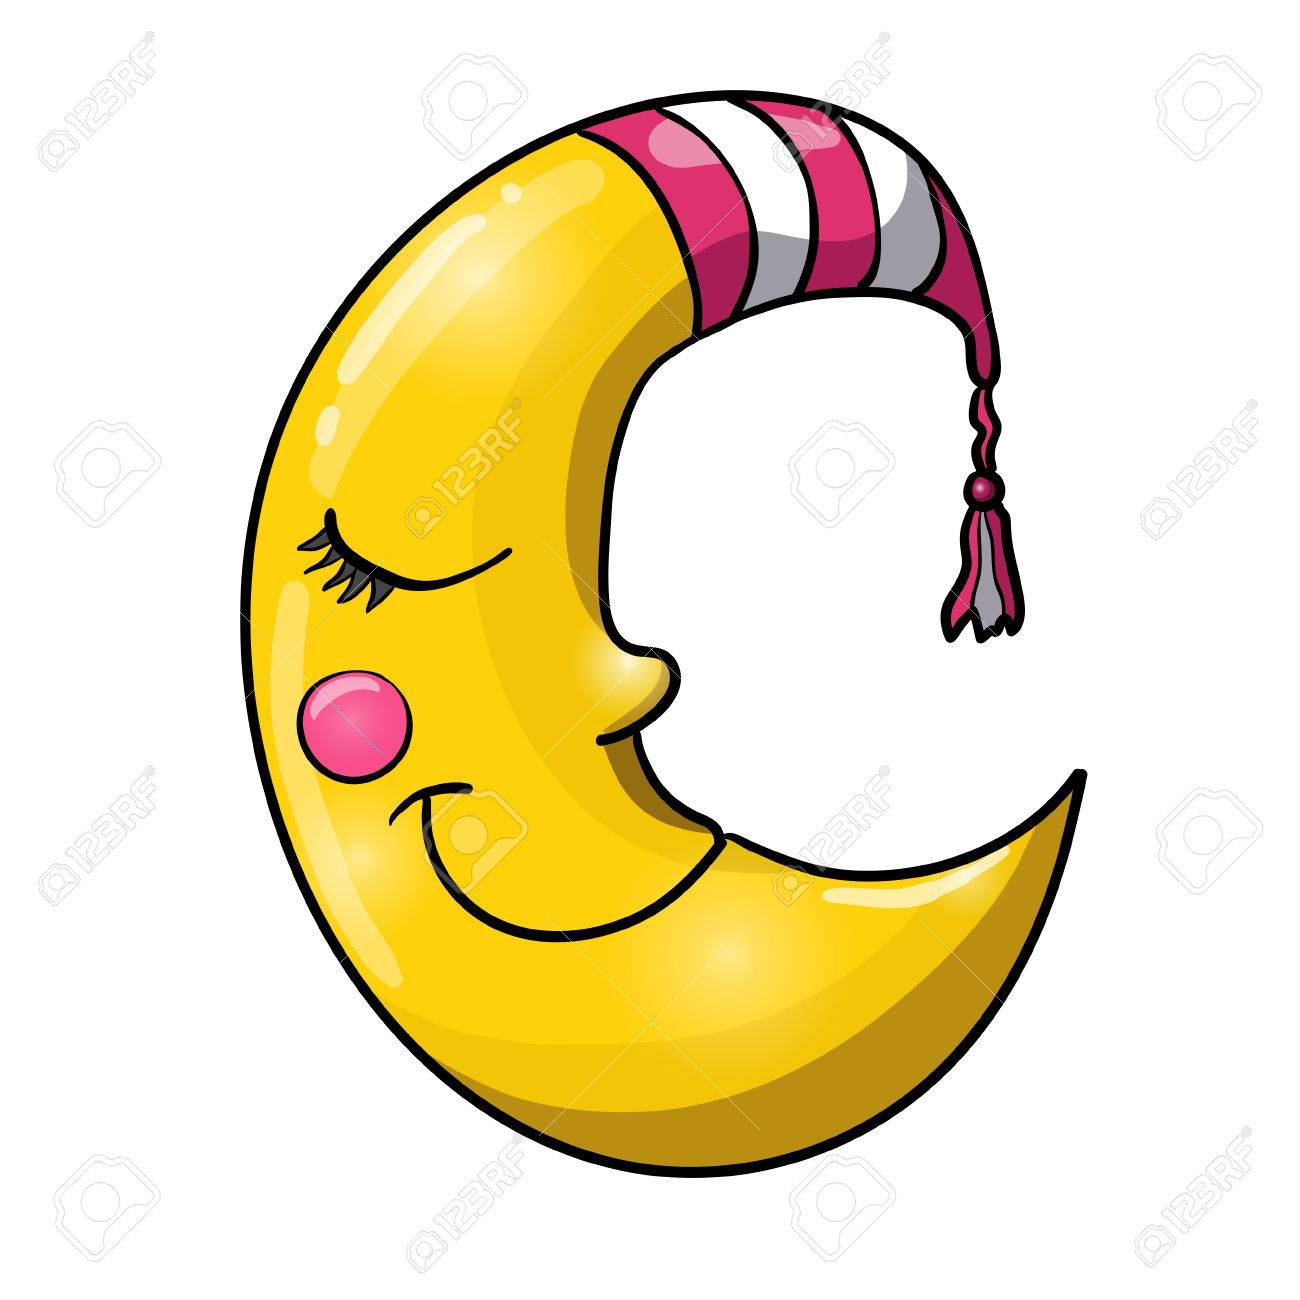 Cartoon sleeping moon in striped nightcap isolated on white background. Good night! - 84803435